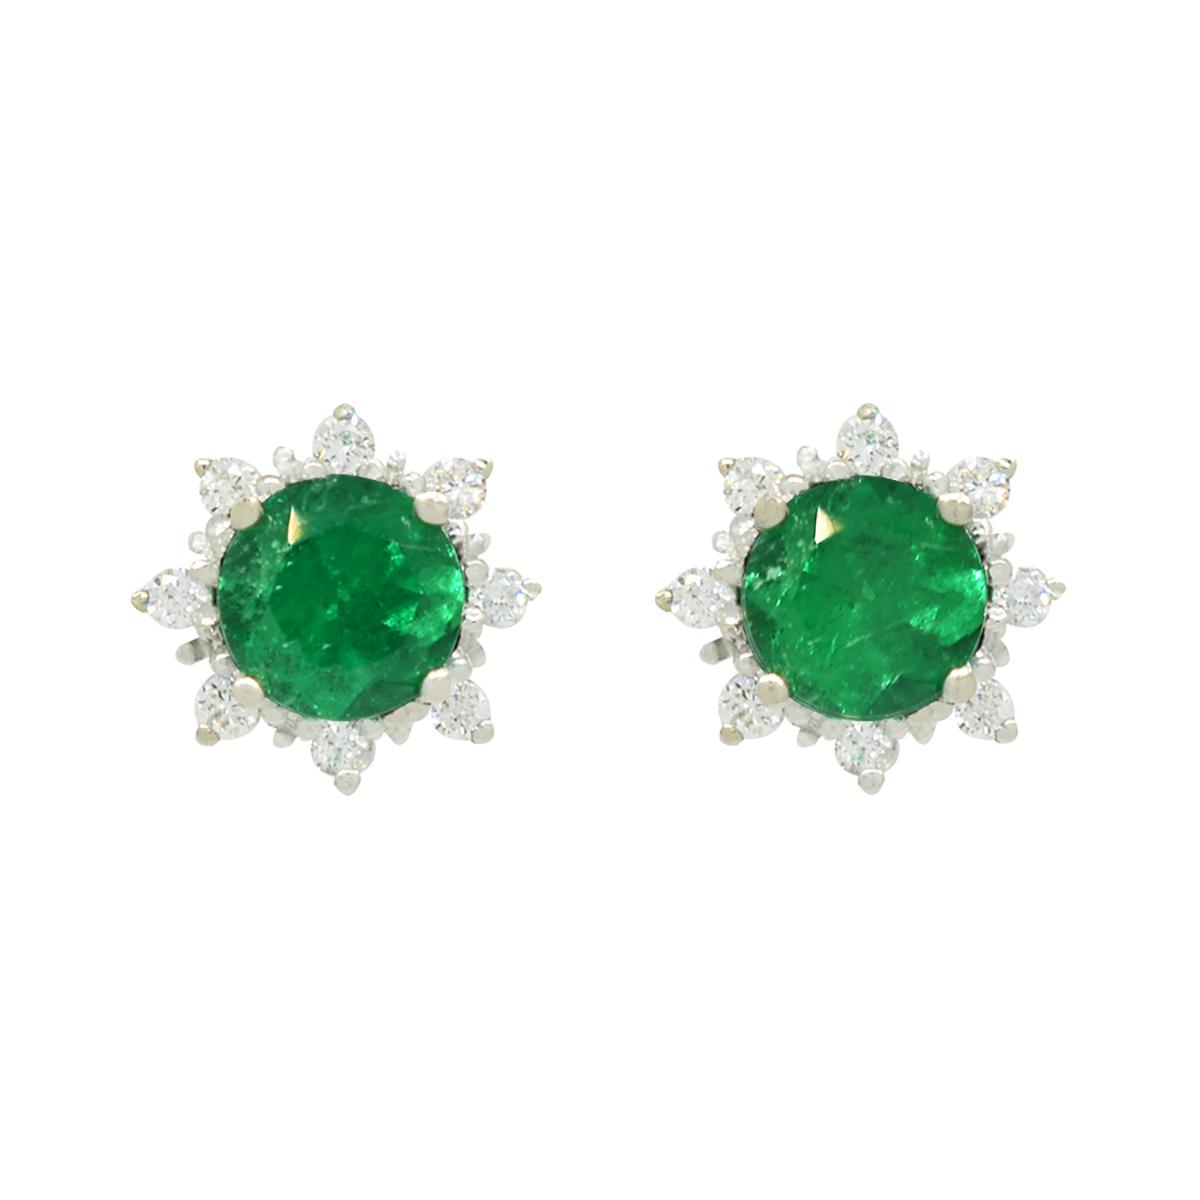 emerald-and-diamond-stud-earrings-in-18k-white-gold-dark-green-emeralds-and-diamond-halo